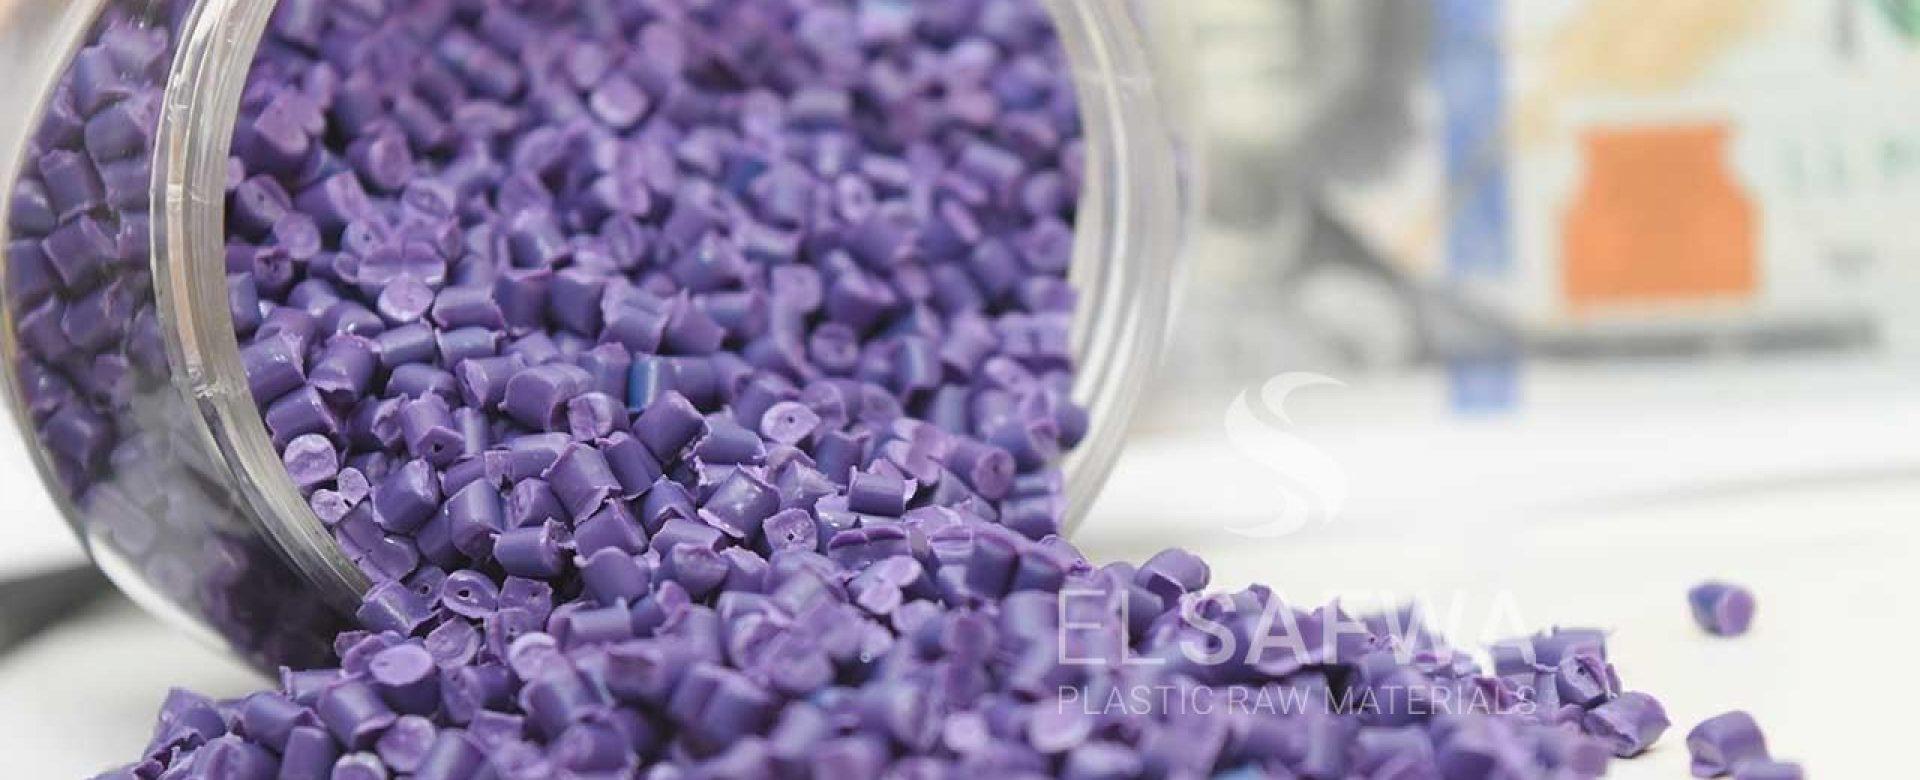 El-safwa-trade-plastic-trading-raw-materials-recycked-pp